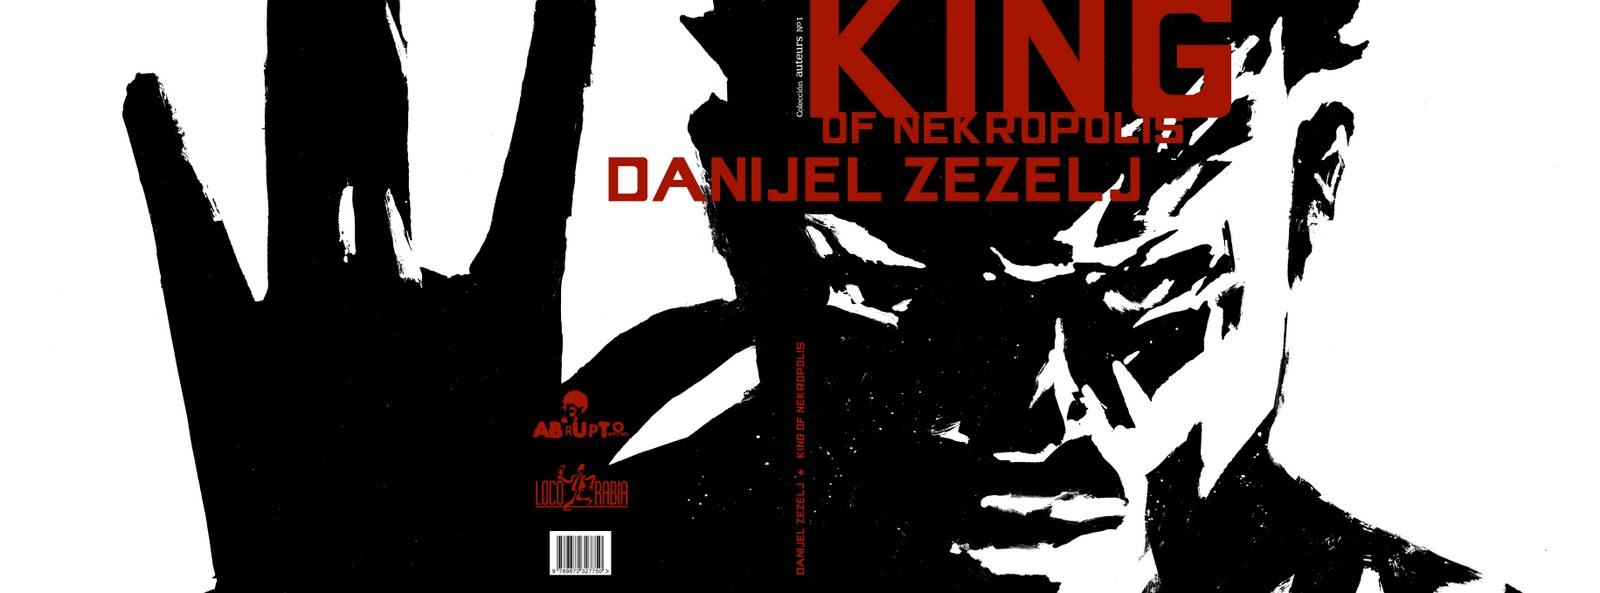 King of Nekropolis de Danijel Zezelj por Ed. Locorabia KING-cover-final